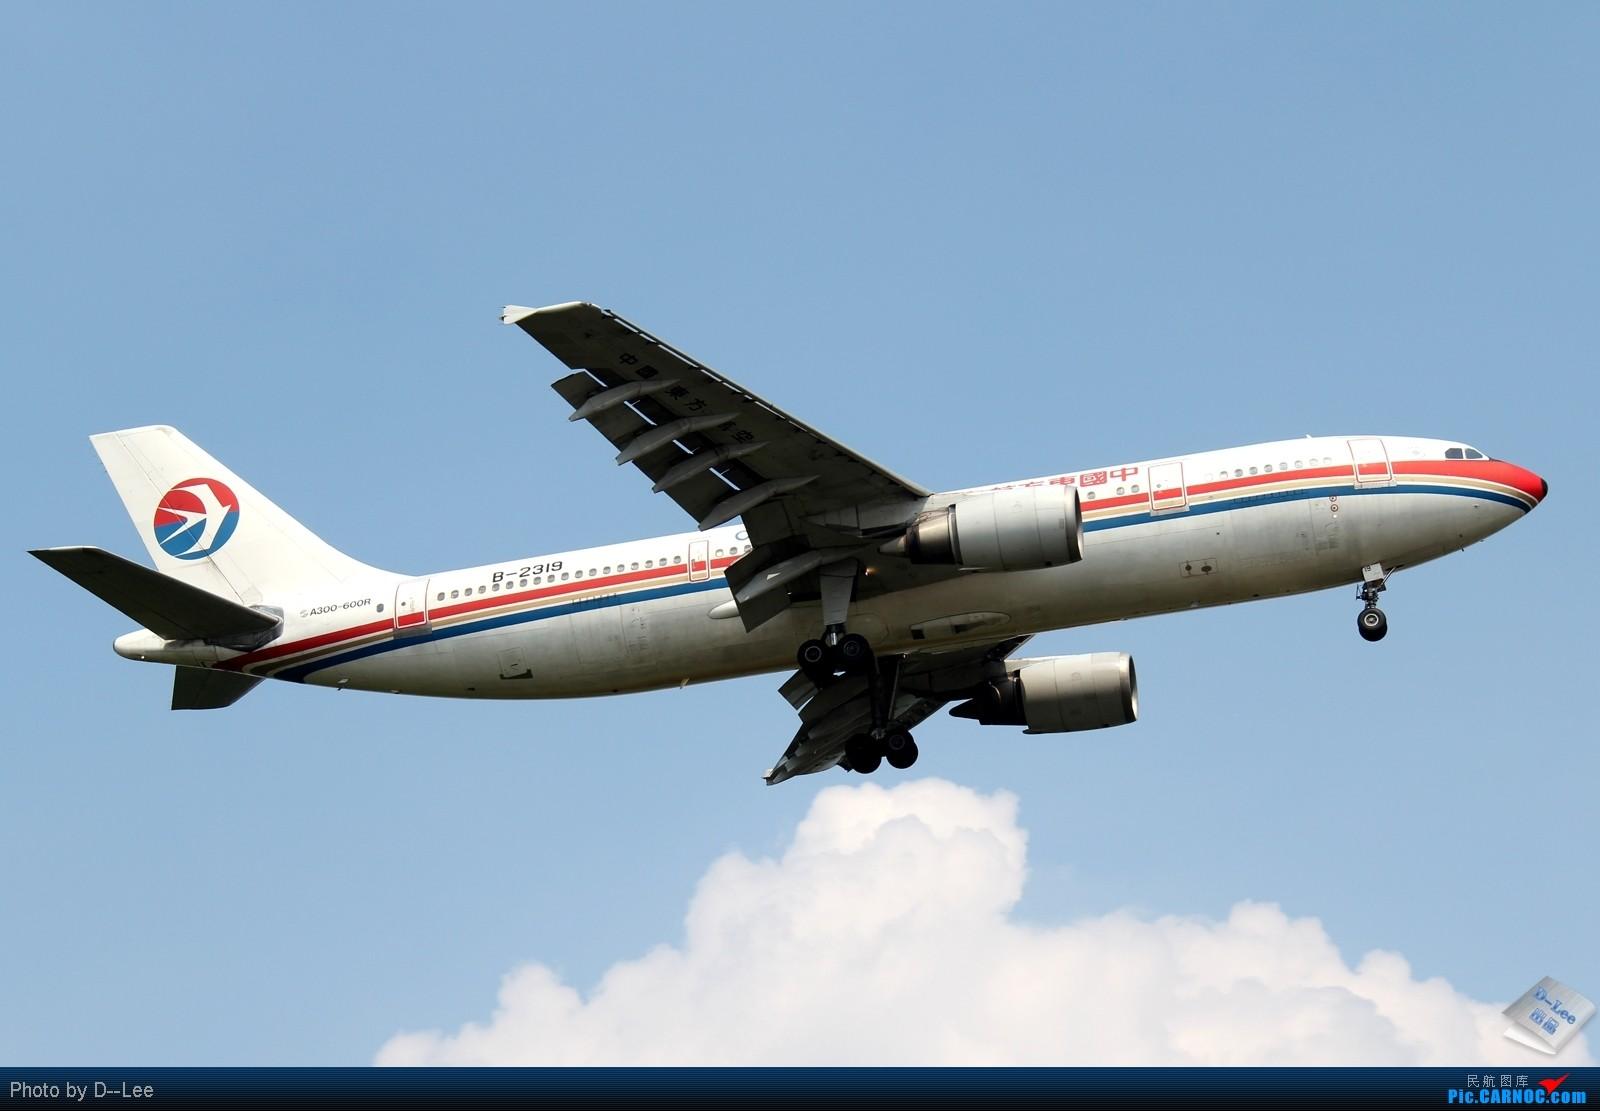 Re:[原创]【广州,你好】-南航SKY TEAM332,港龙333,泰航大星星333外加拍少见少东航AB6全程1600大图放送 AIRBUS A300-B4-600R B-2319 中国广州白云机场